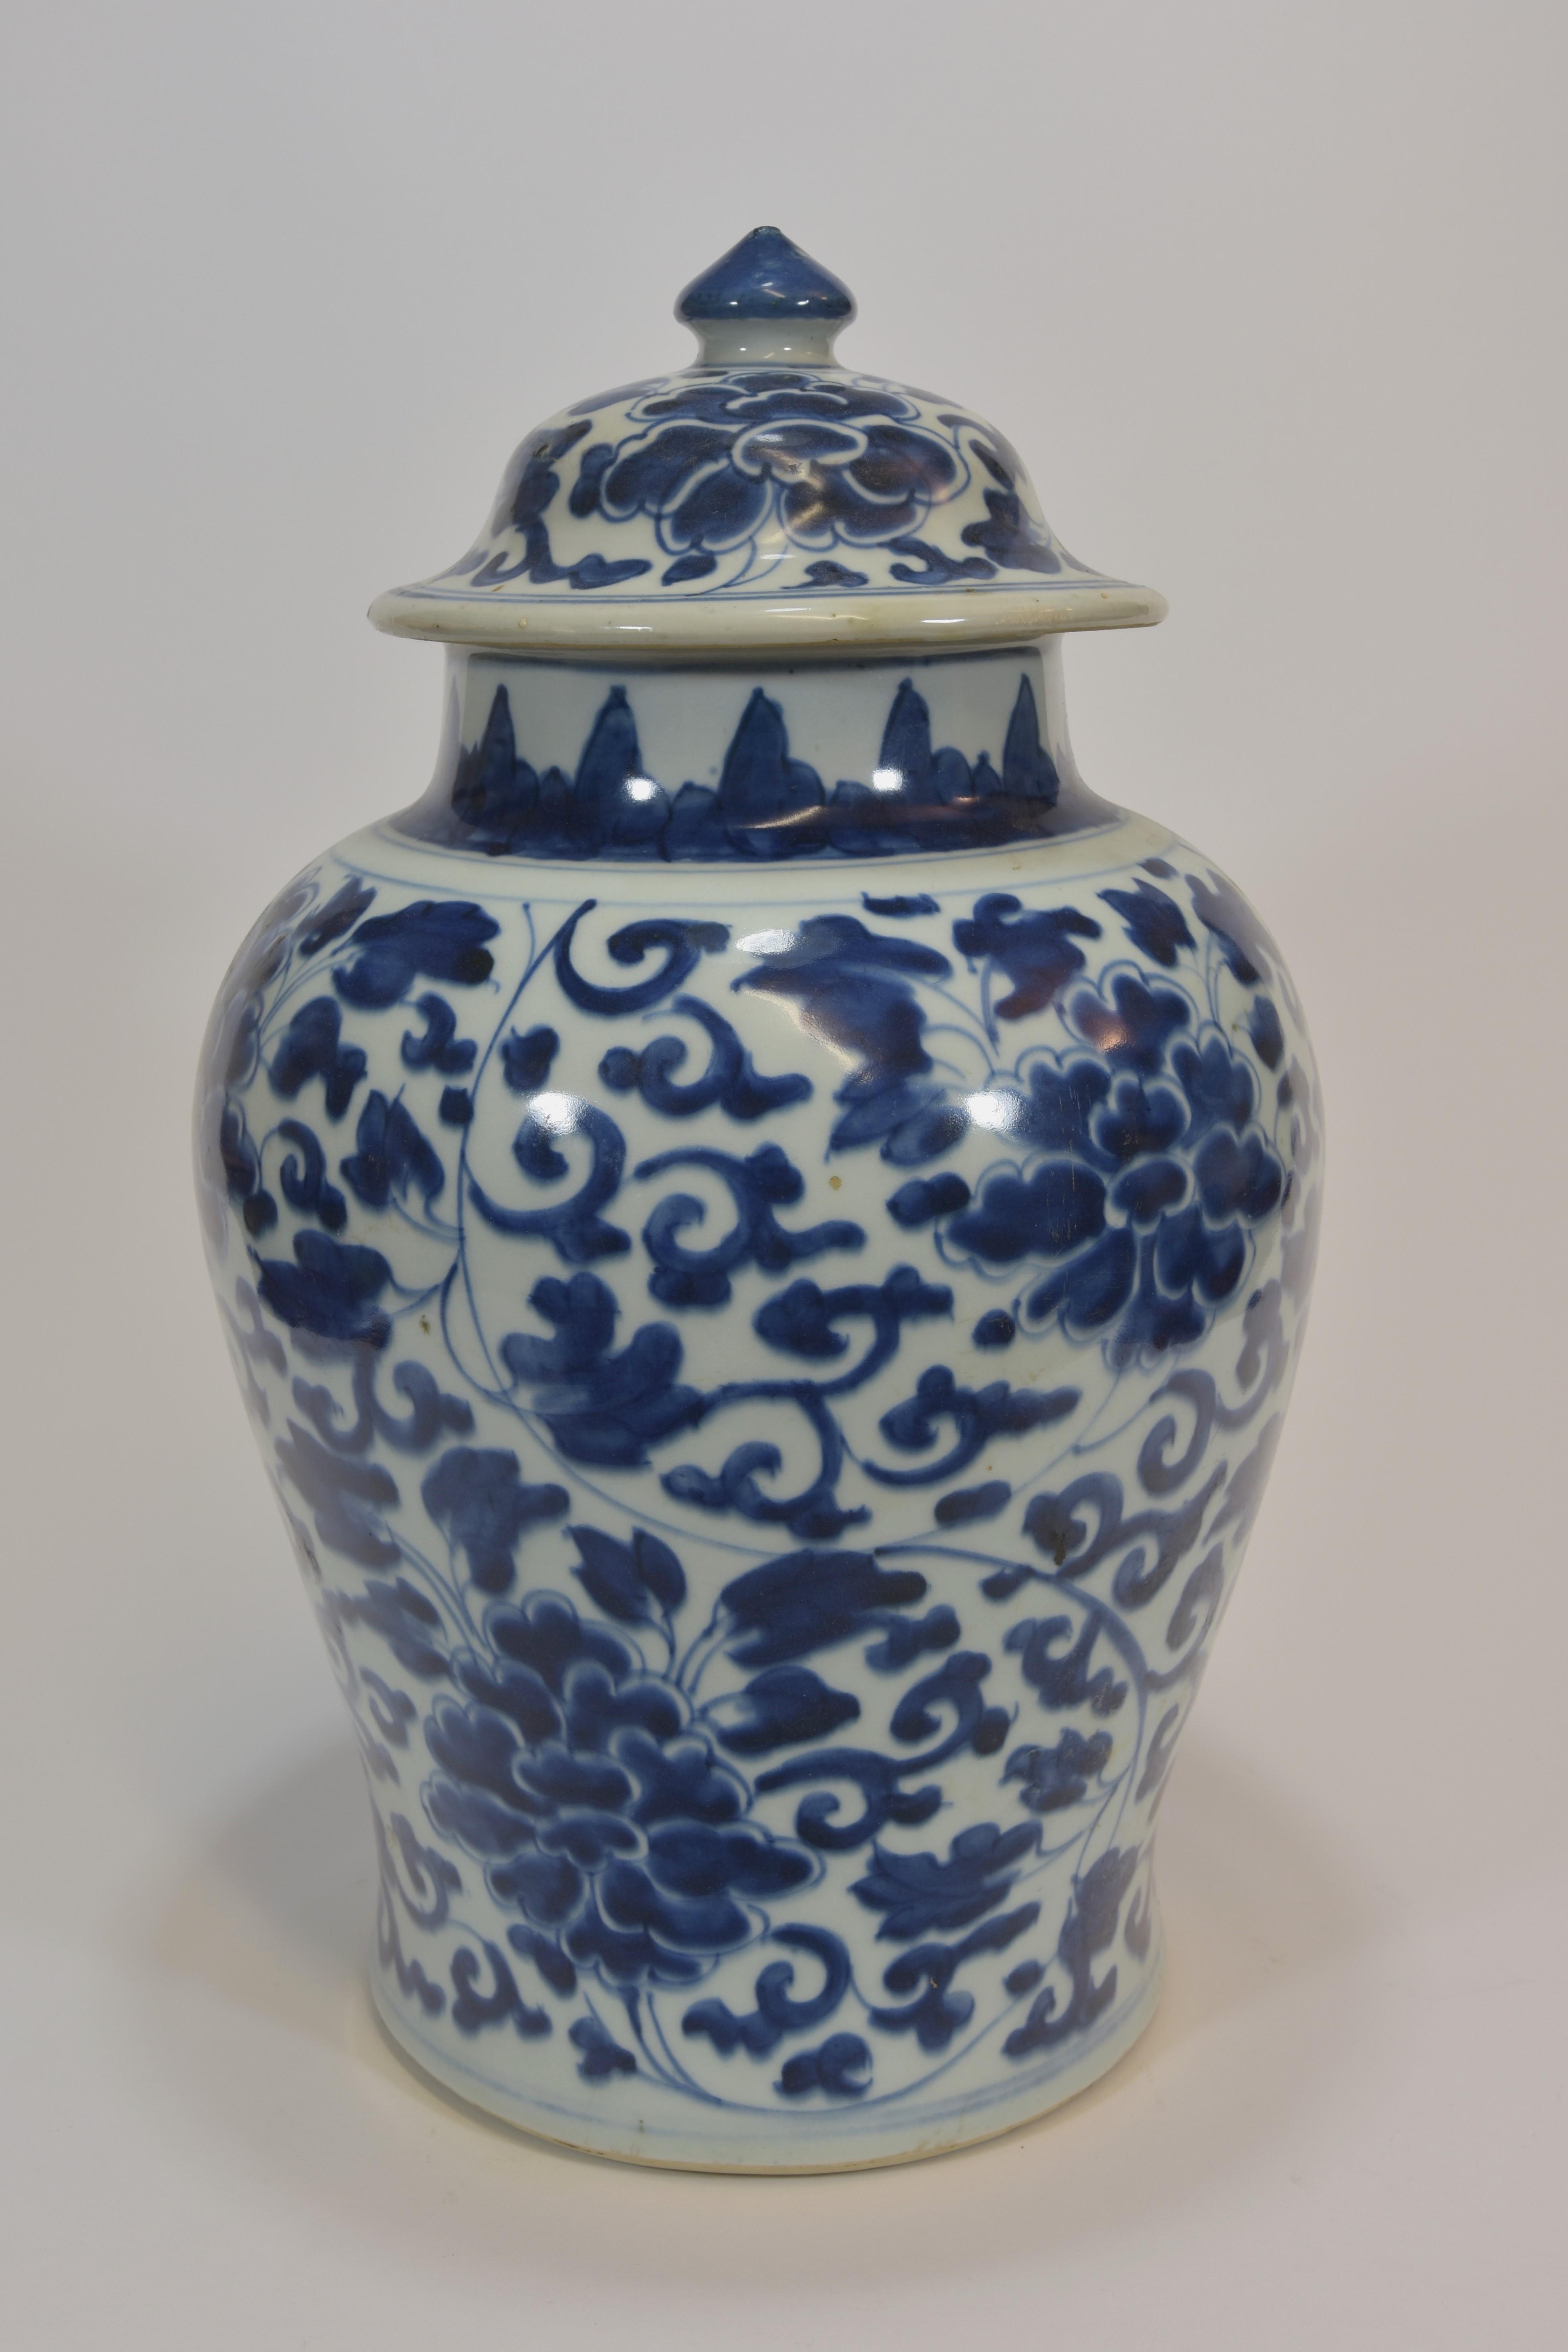 Lot 36 - A Kangxi blue and white jar with cover 39cm清 十九世紀 青花纏枝蓮大罐